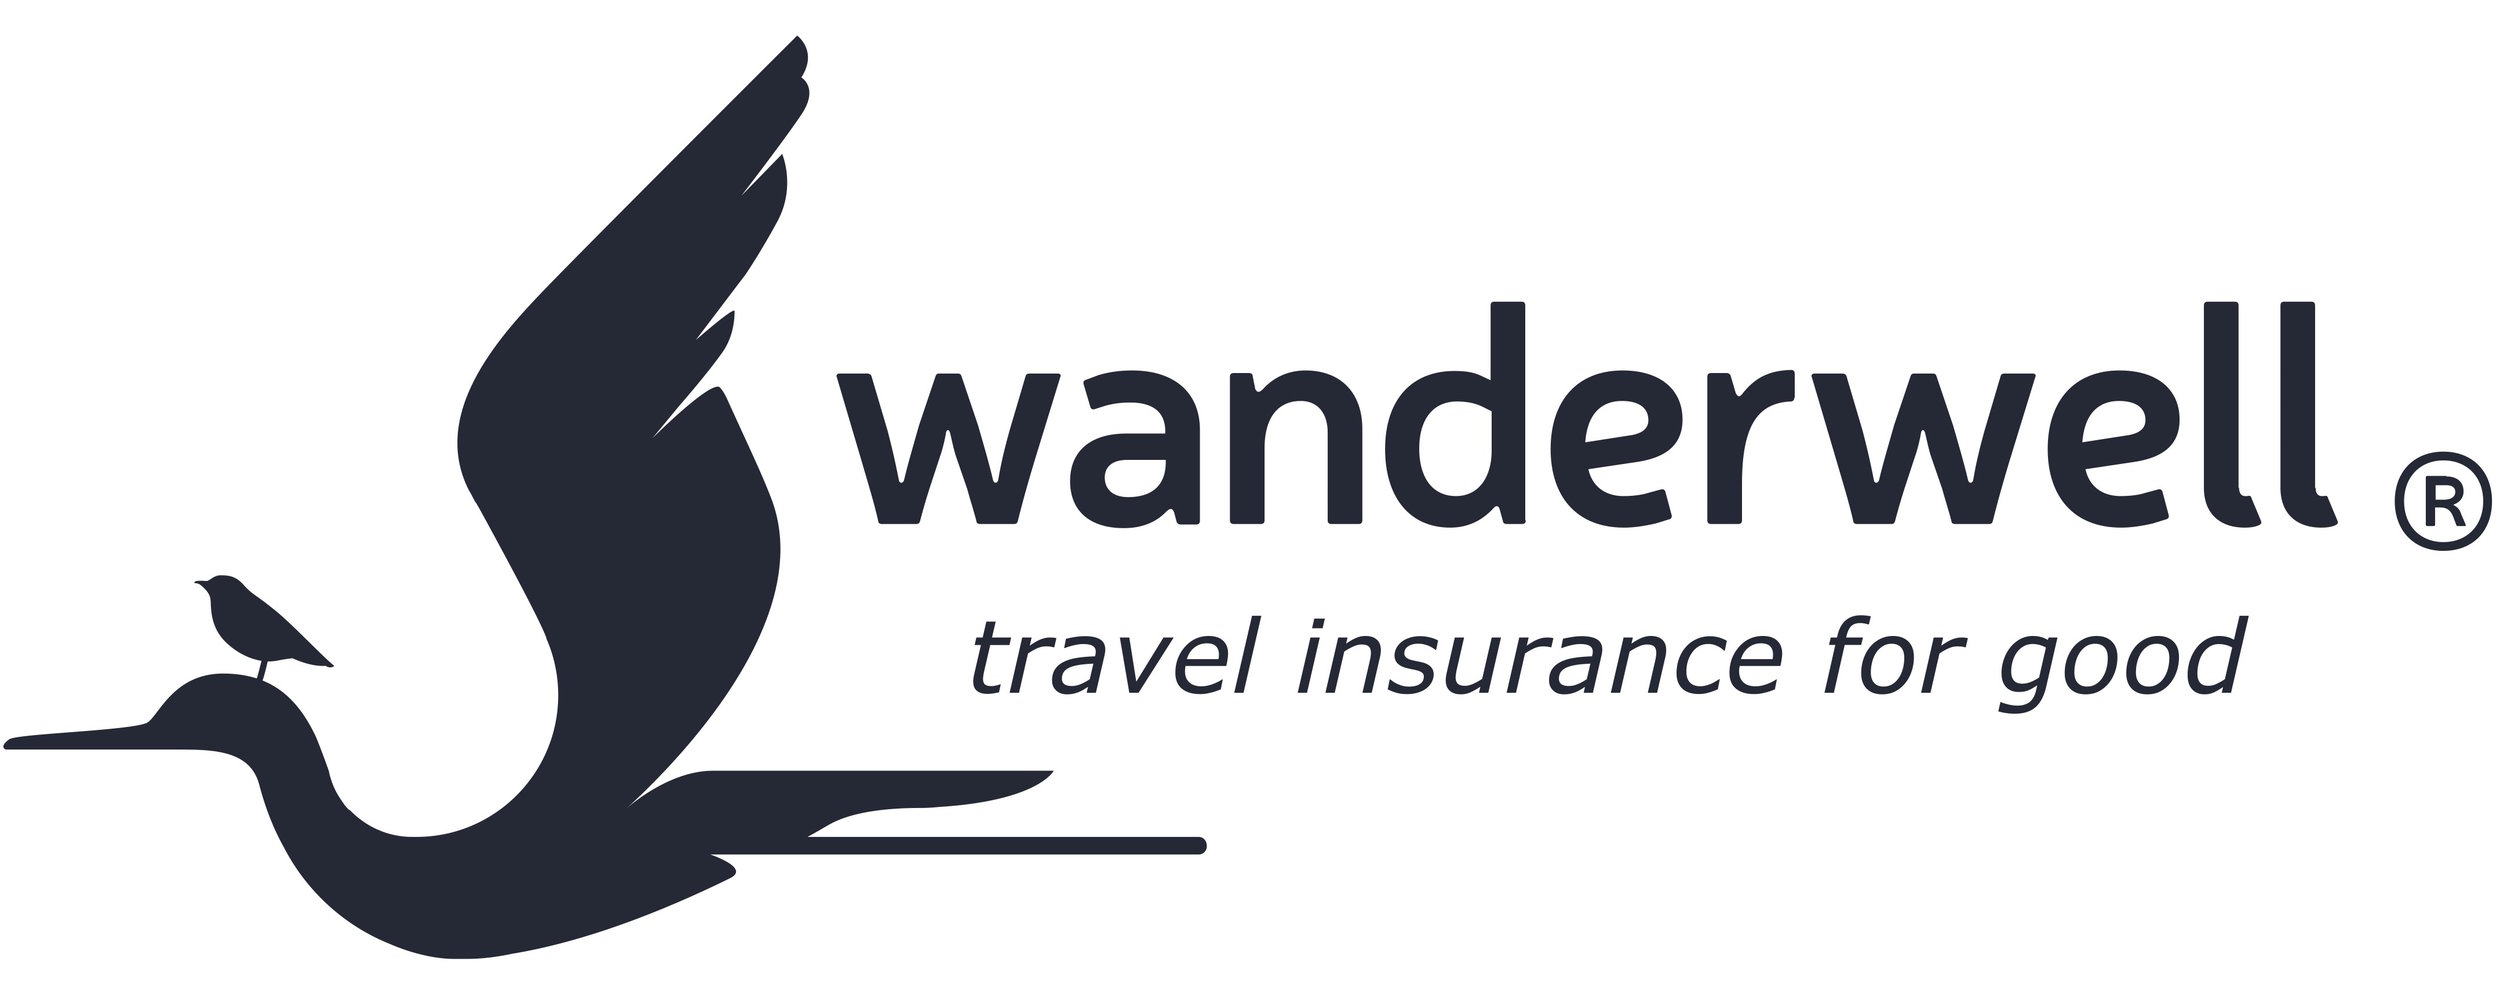 wanderwell.jpg